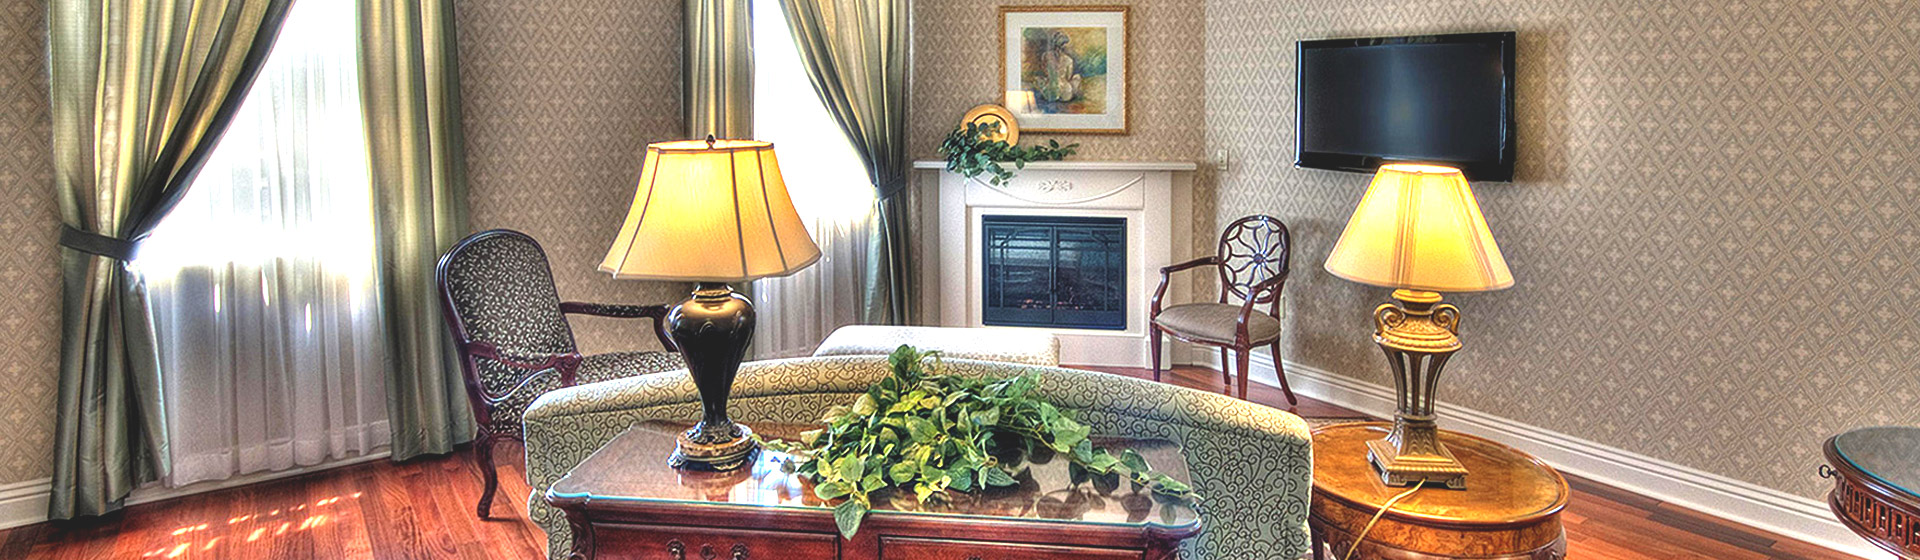 Room With Televison at Charley Creek Inn - Wabash, Indiana